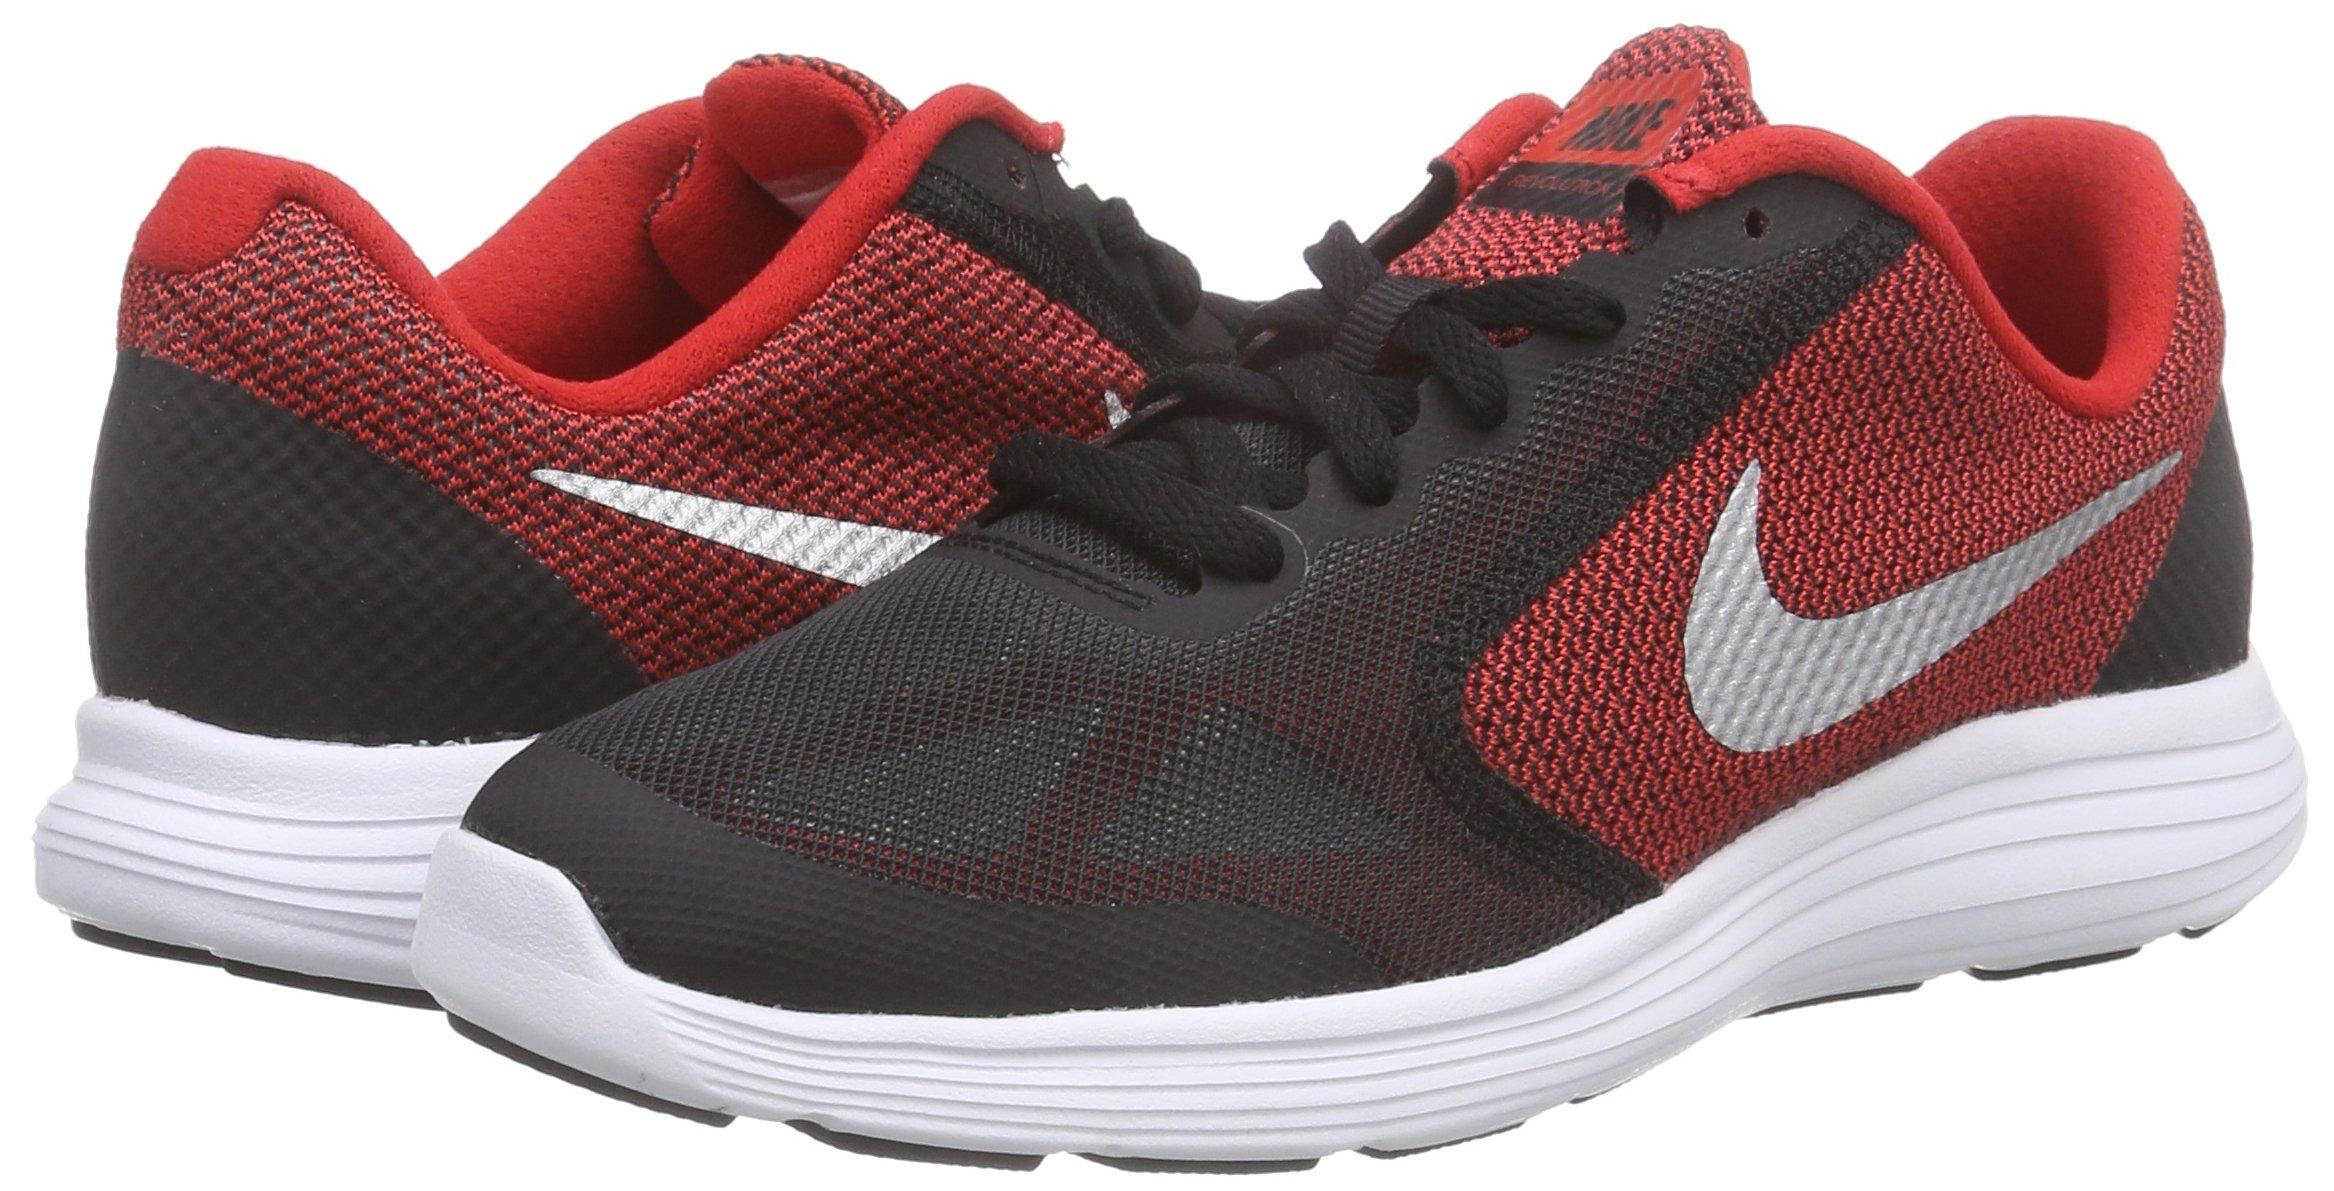 NIKE Boys' Revolution 3 Running Shoe (GS), University Red/Metallic Silver/Black, 3.5 M US Big Kid by Nike (Image #5)